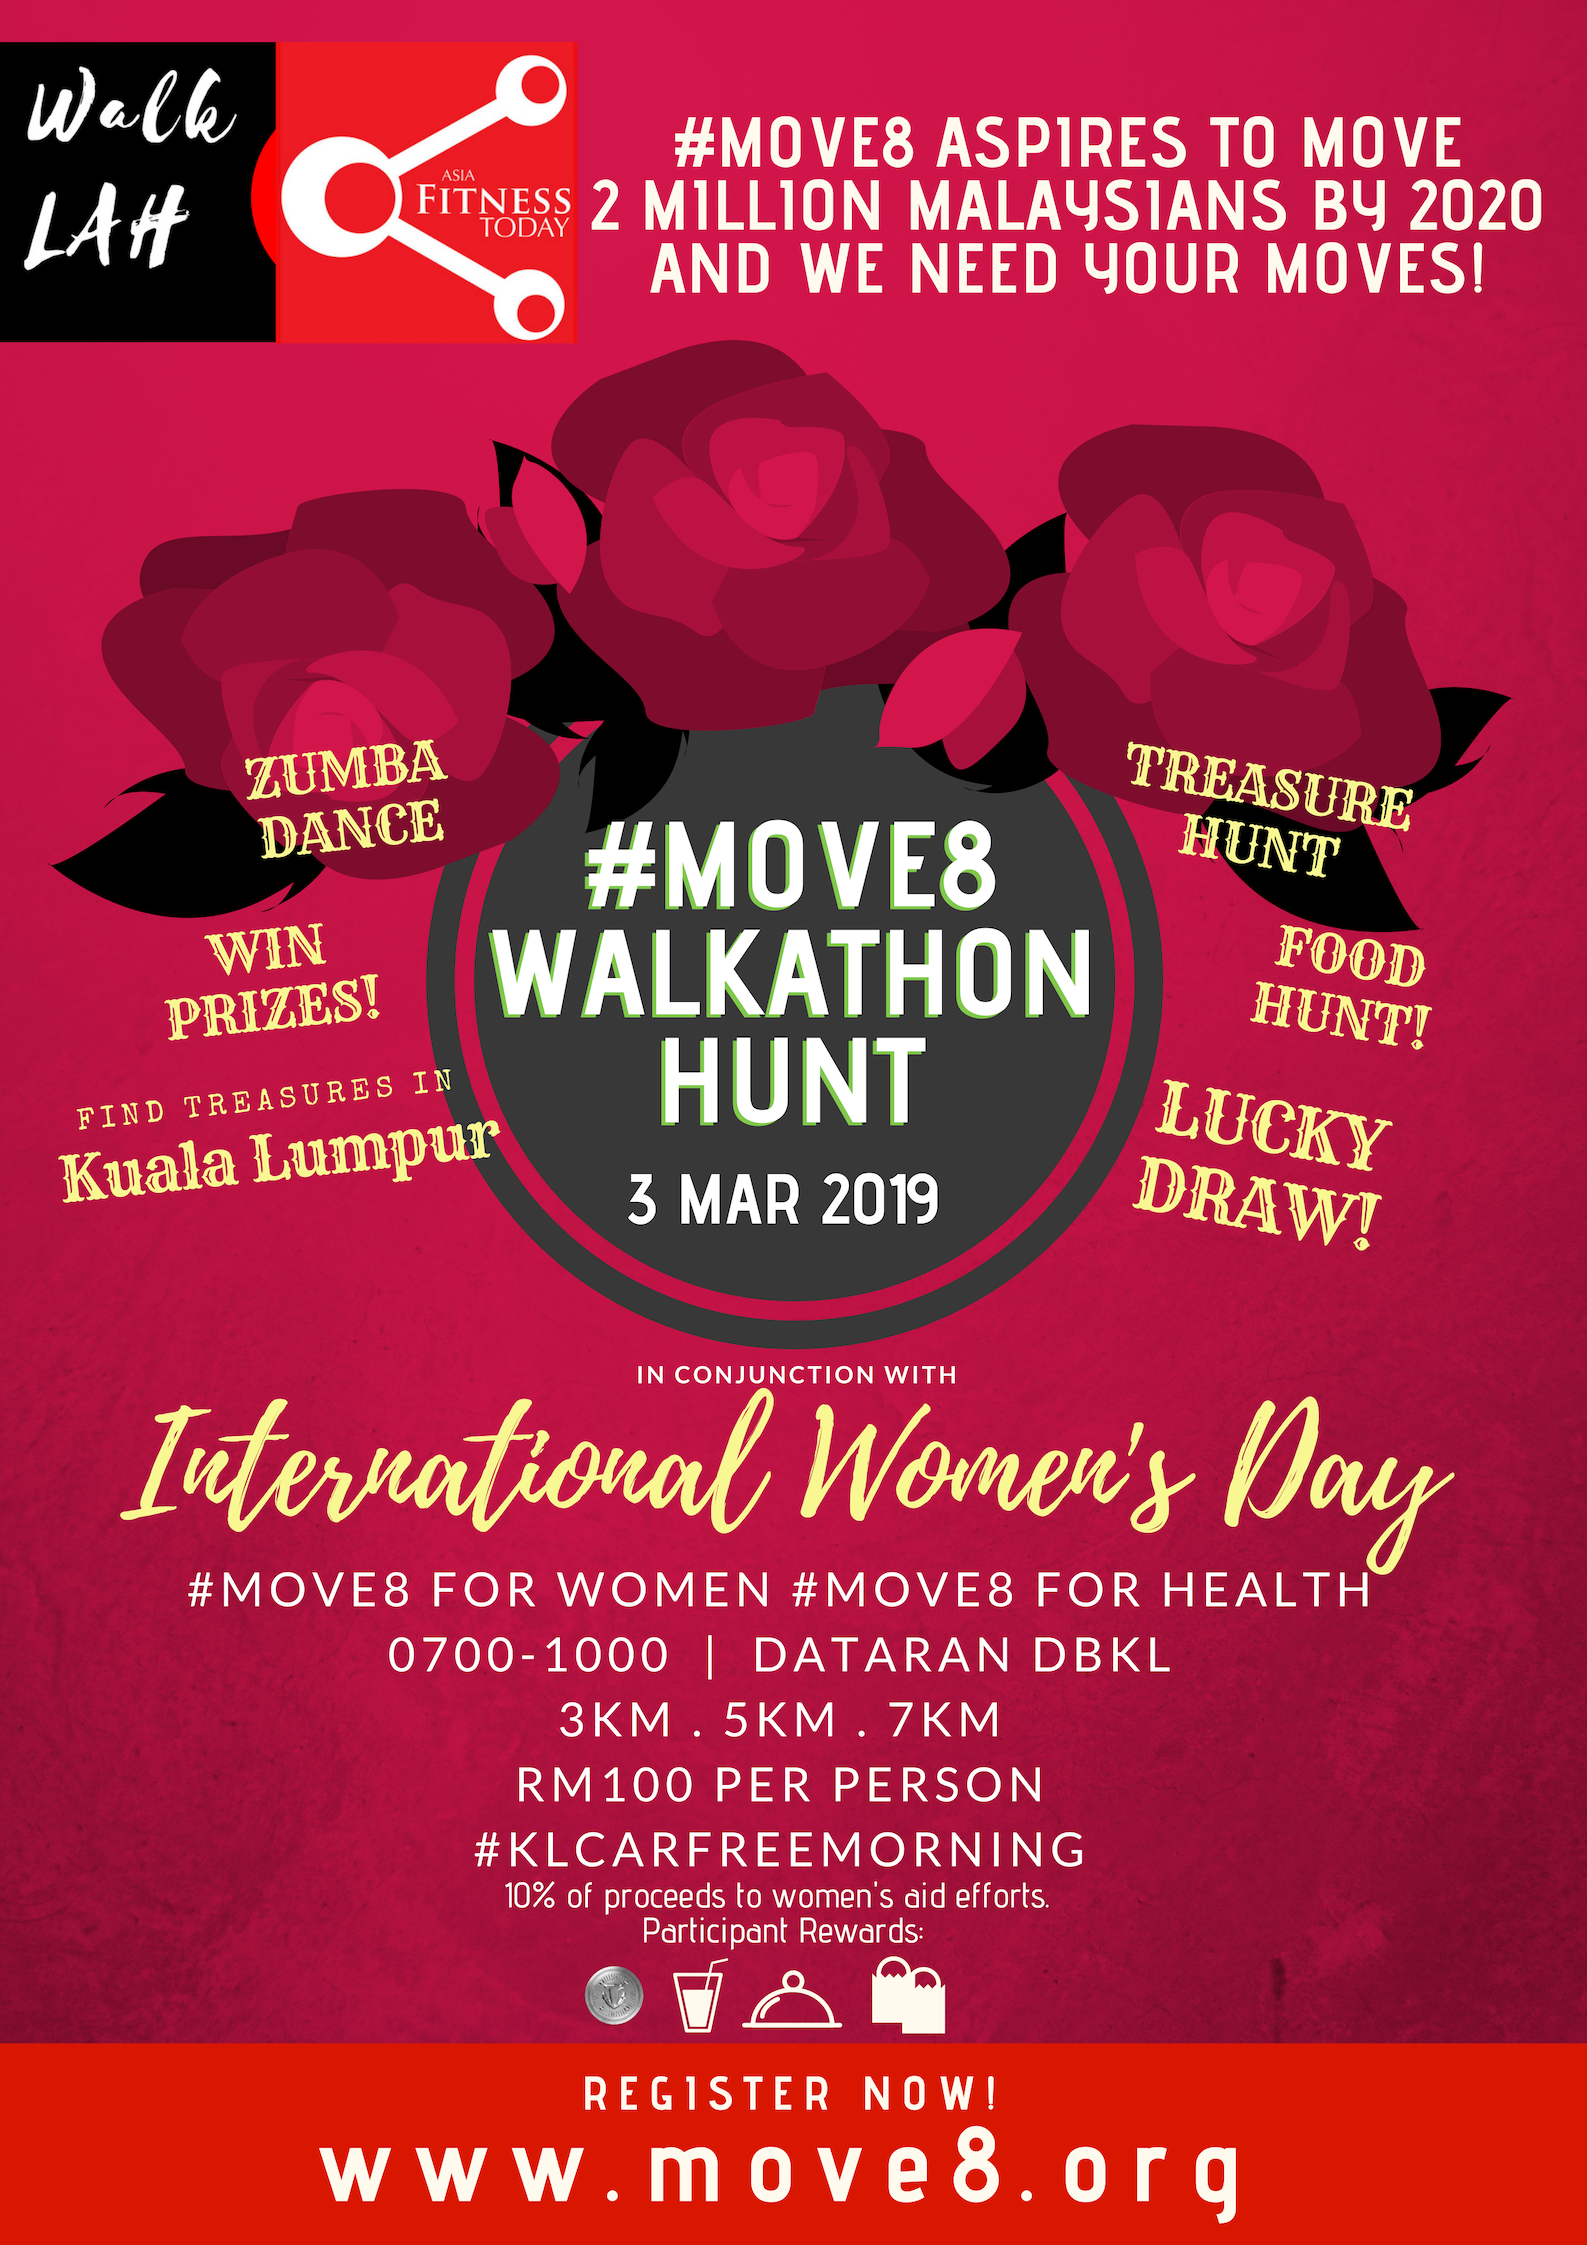 #Move8 7KM Walkathon on International Women's Day